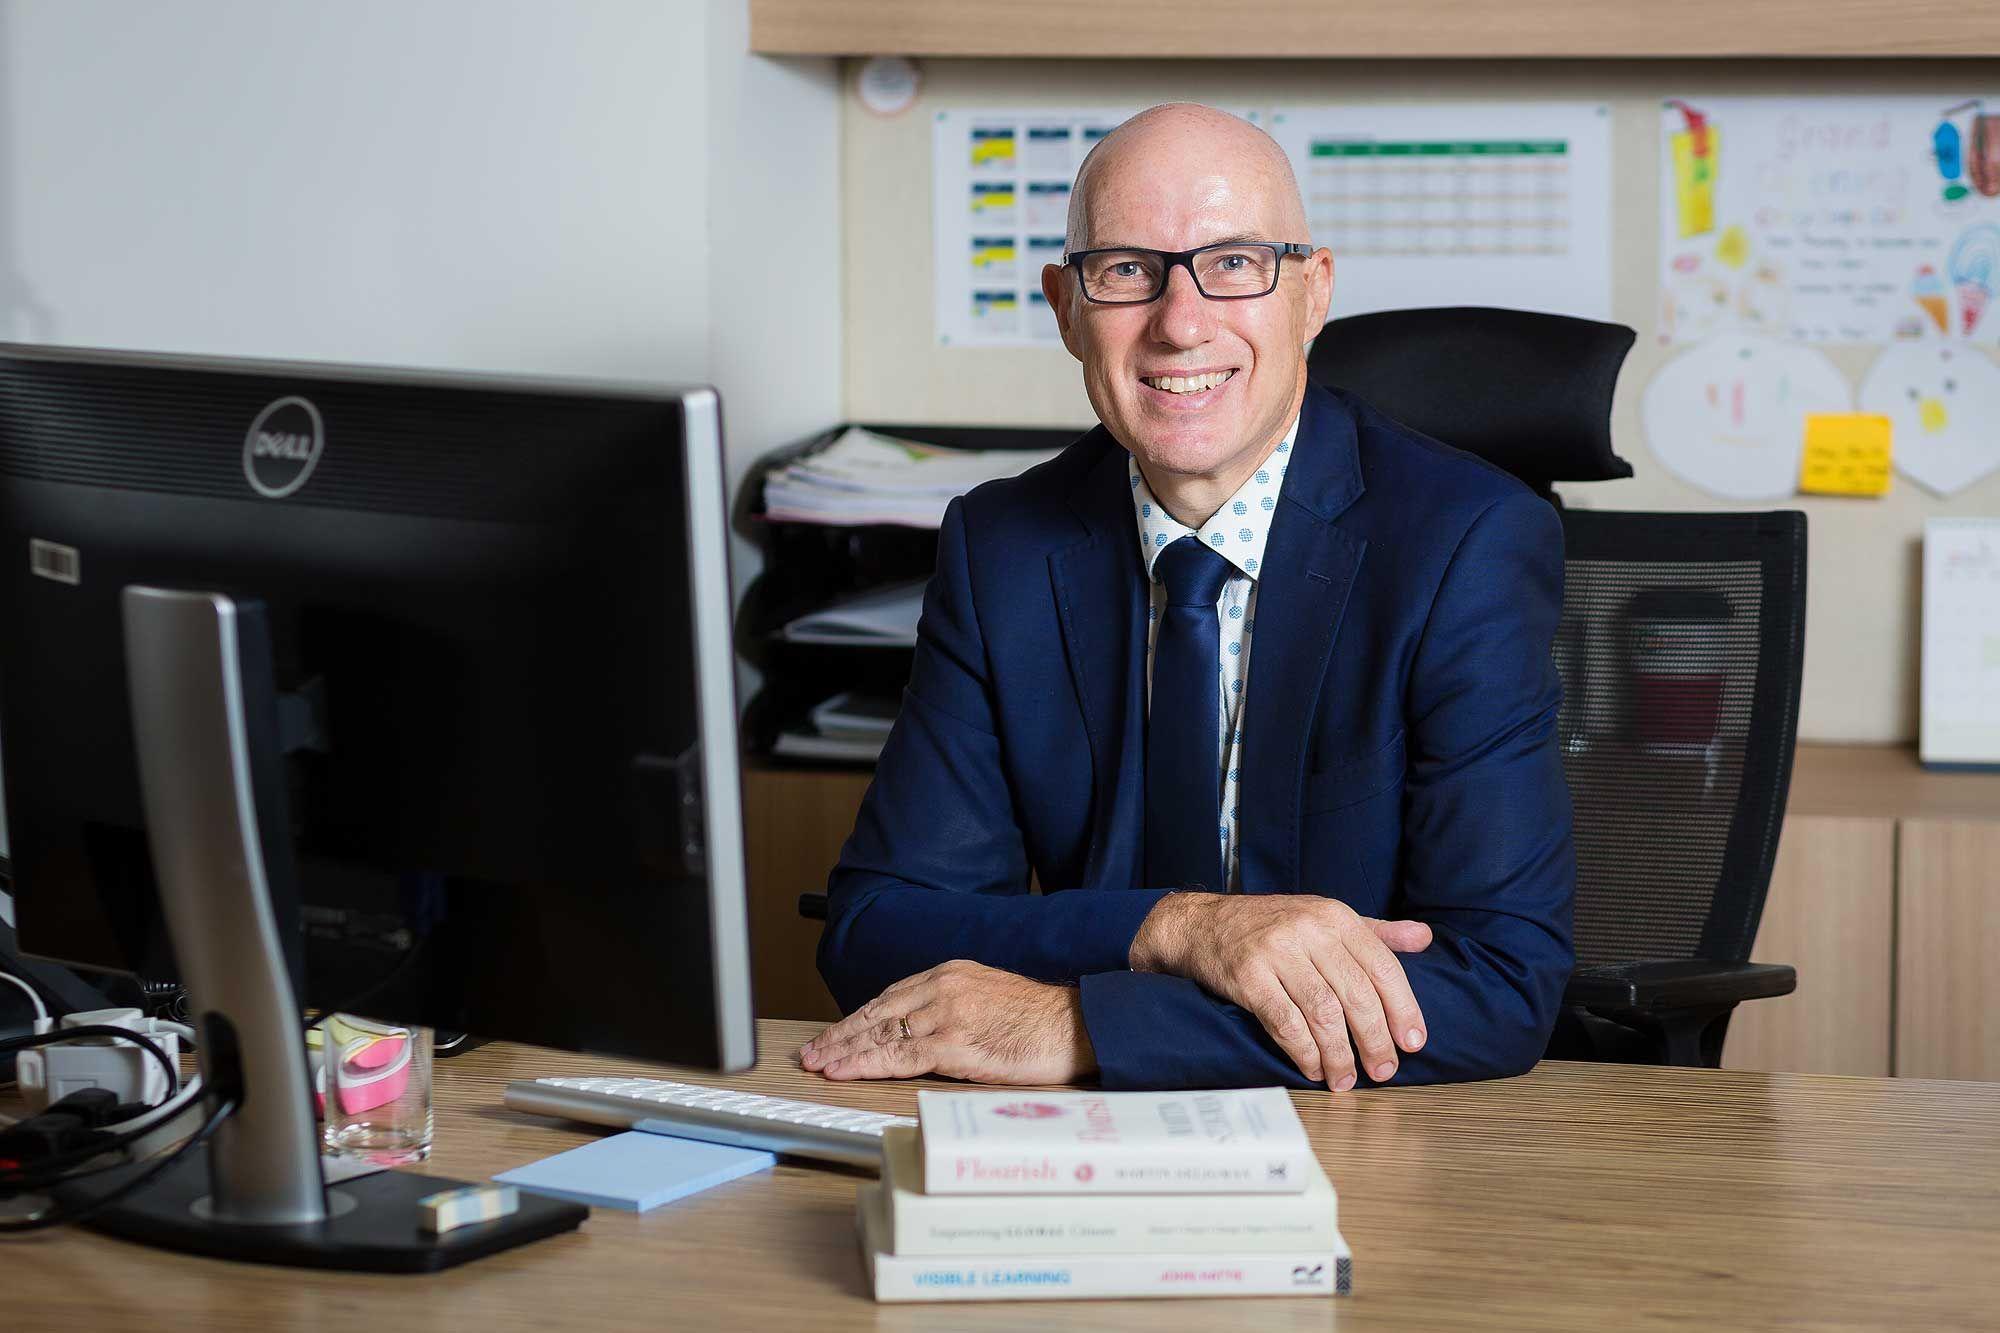 Principal Liam King